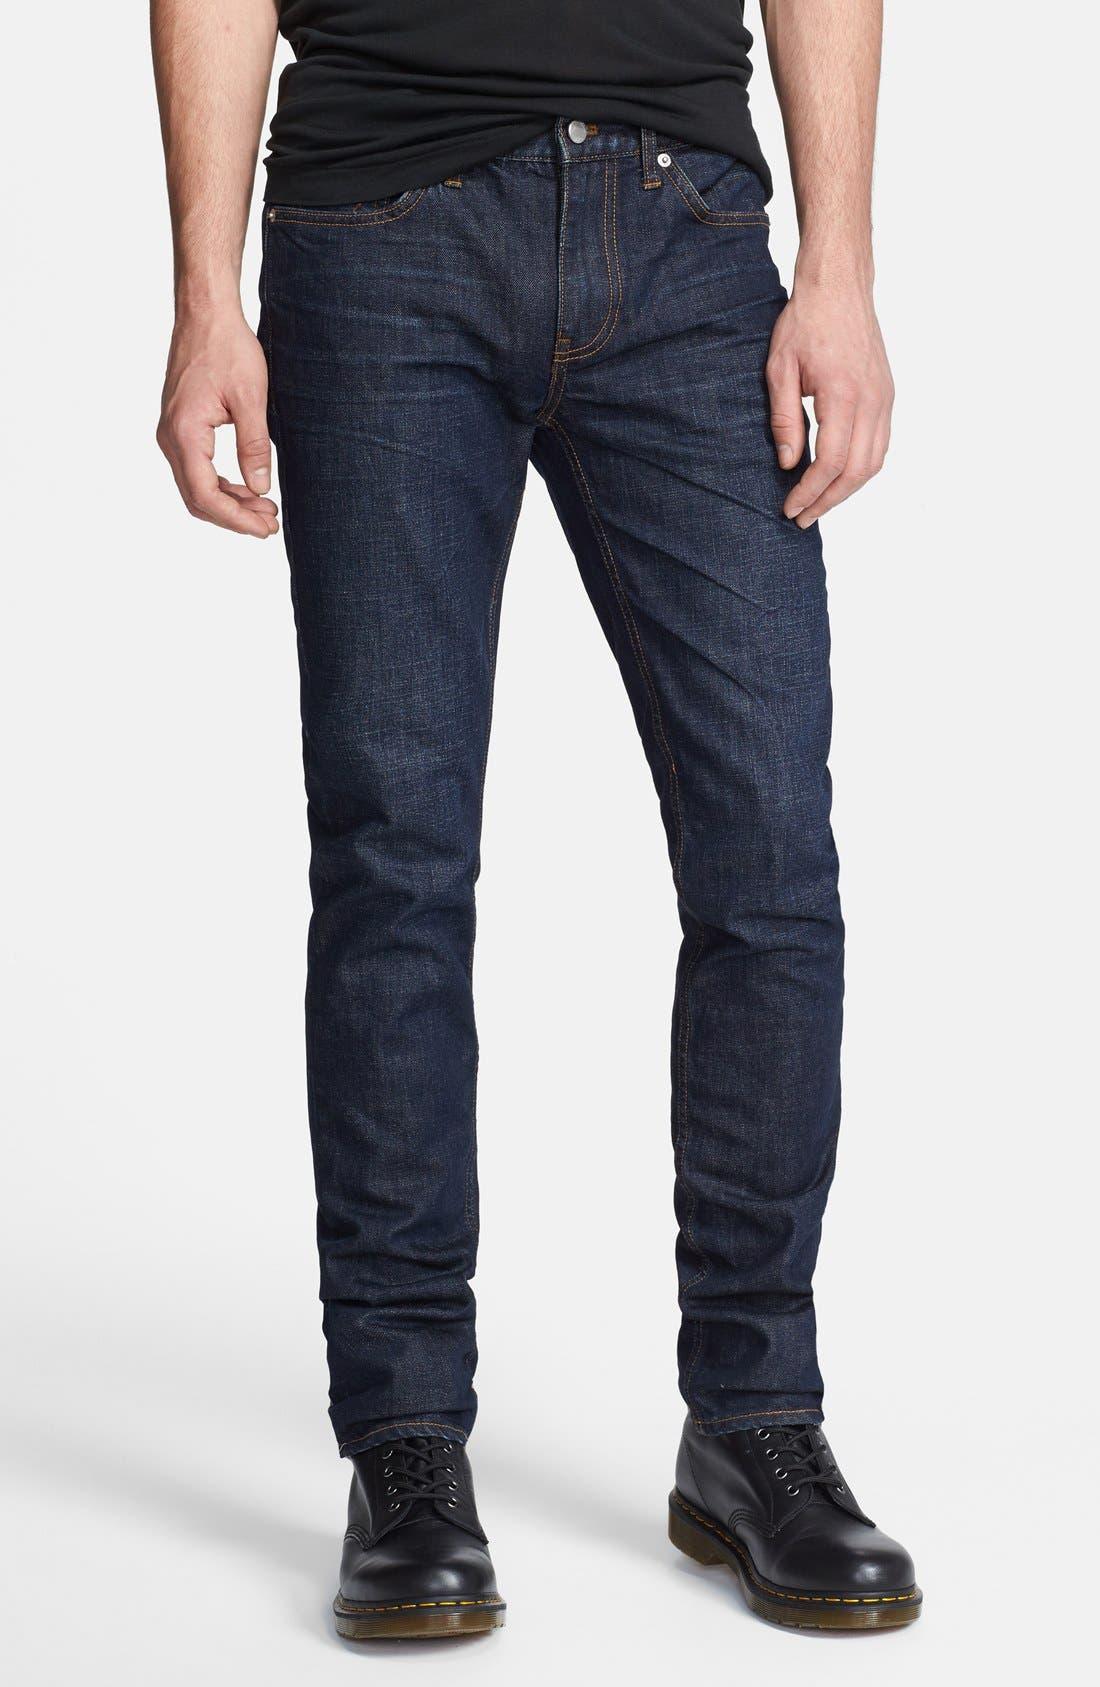 Alternate Image 1 Selected - BLK DNM Skinny Fit Jeans (Gates Blue)